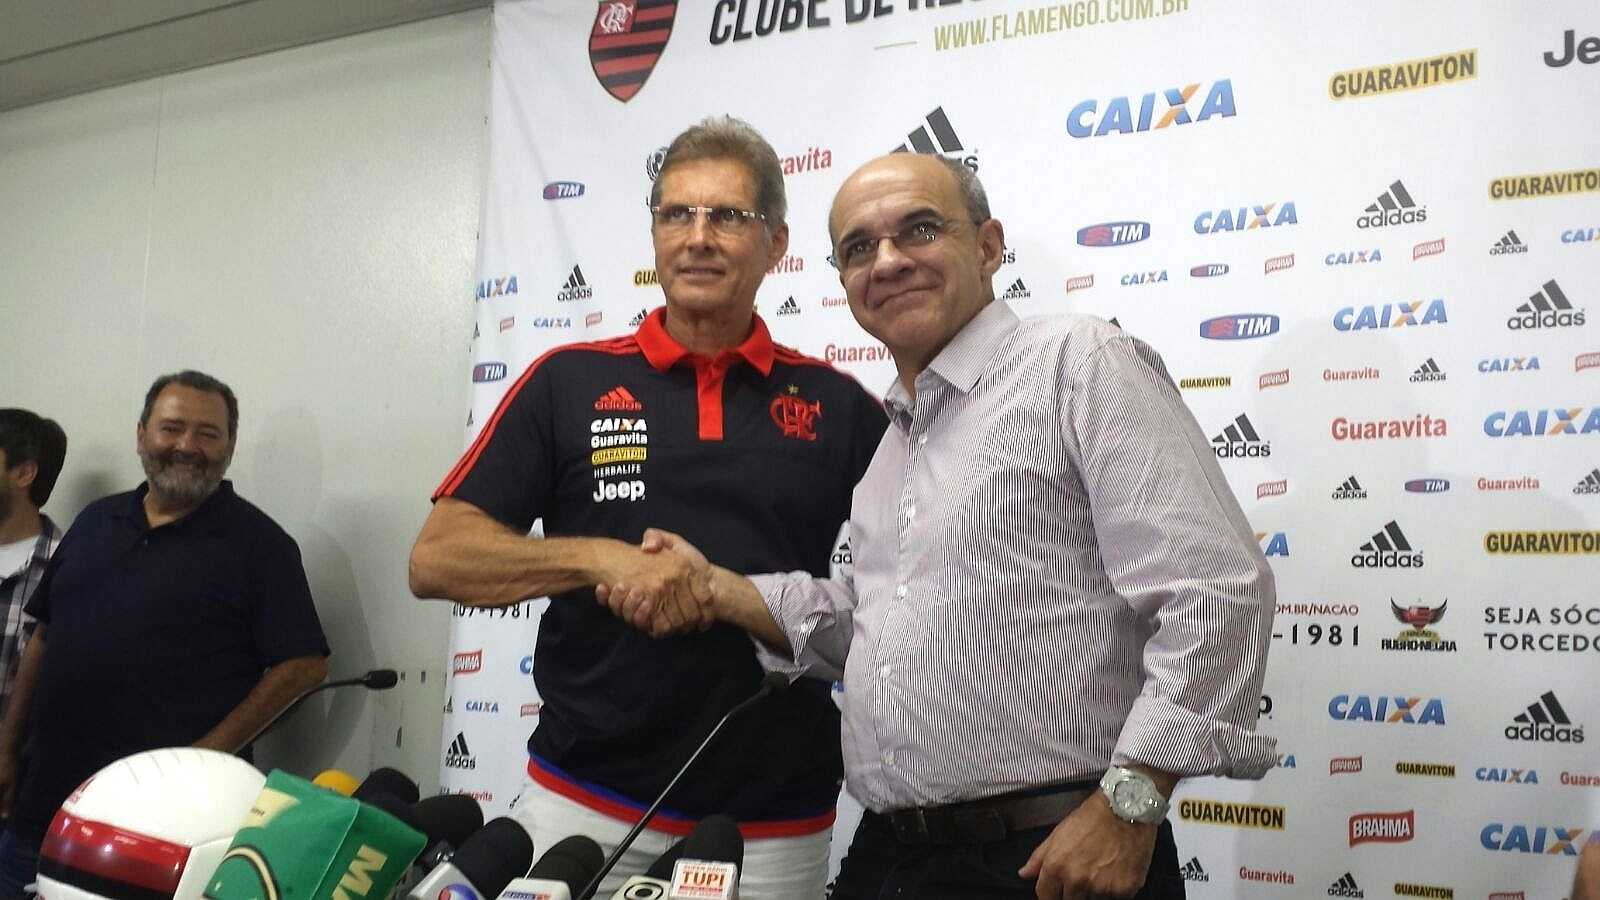 Novo treinador do Fla, Oswaldo de Oliveira cumprimenta presidente Eduardo Bandeira de Mello